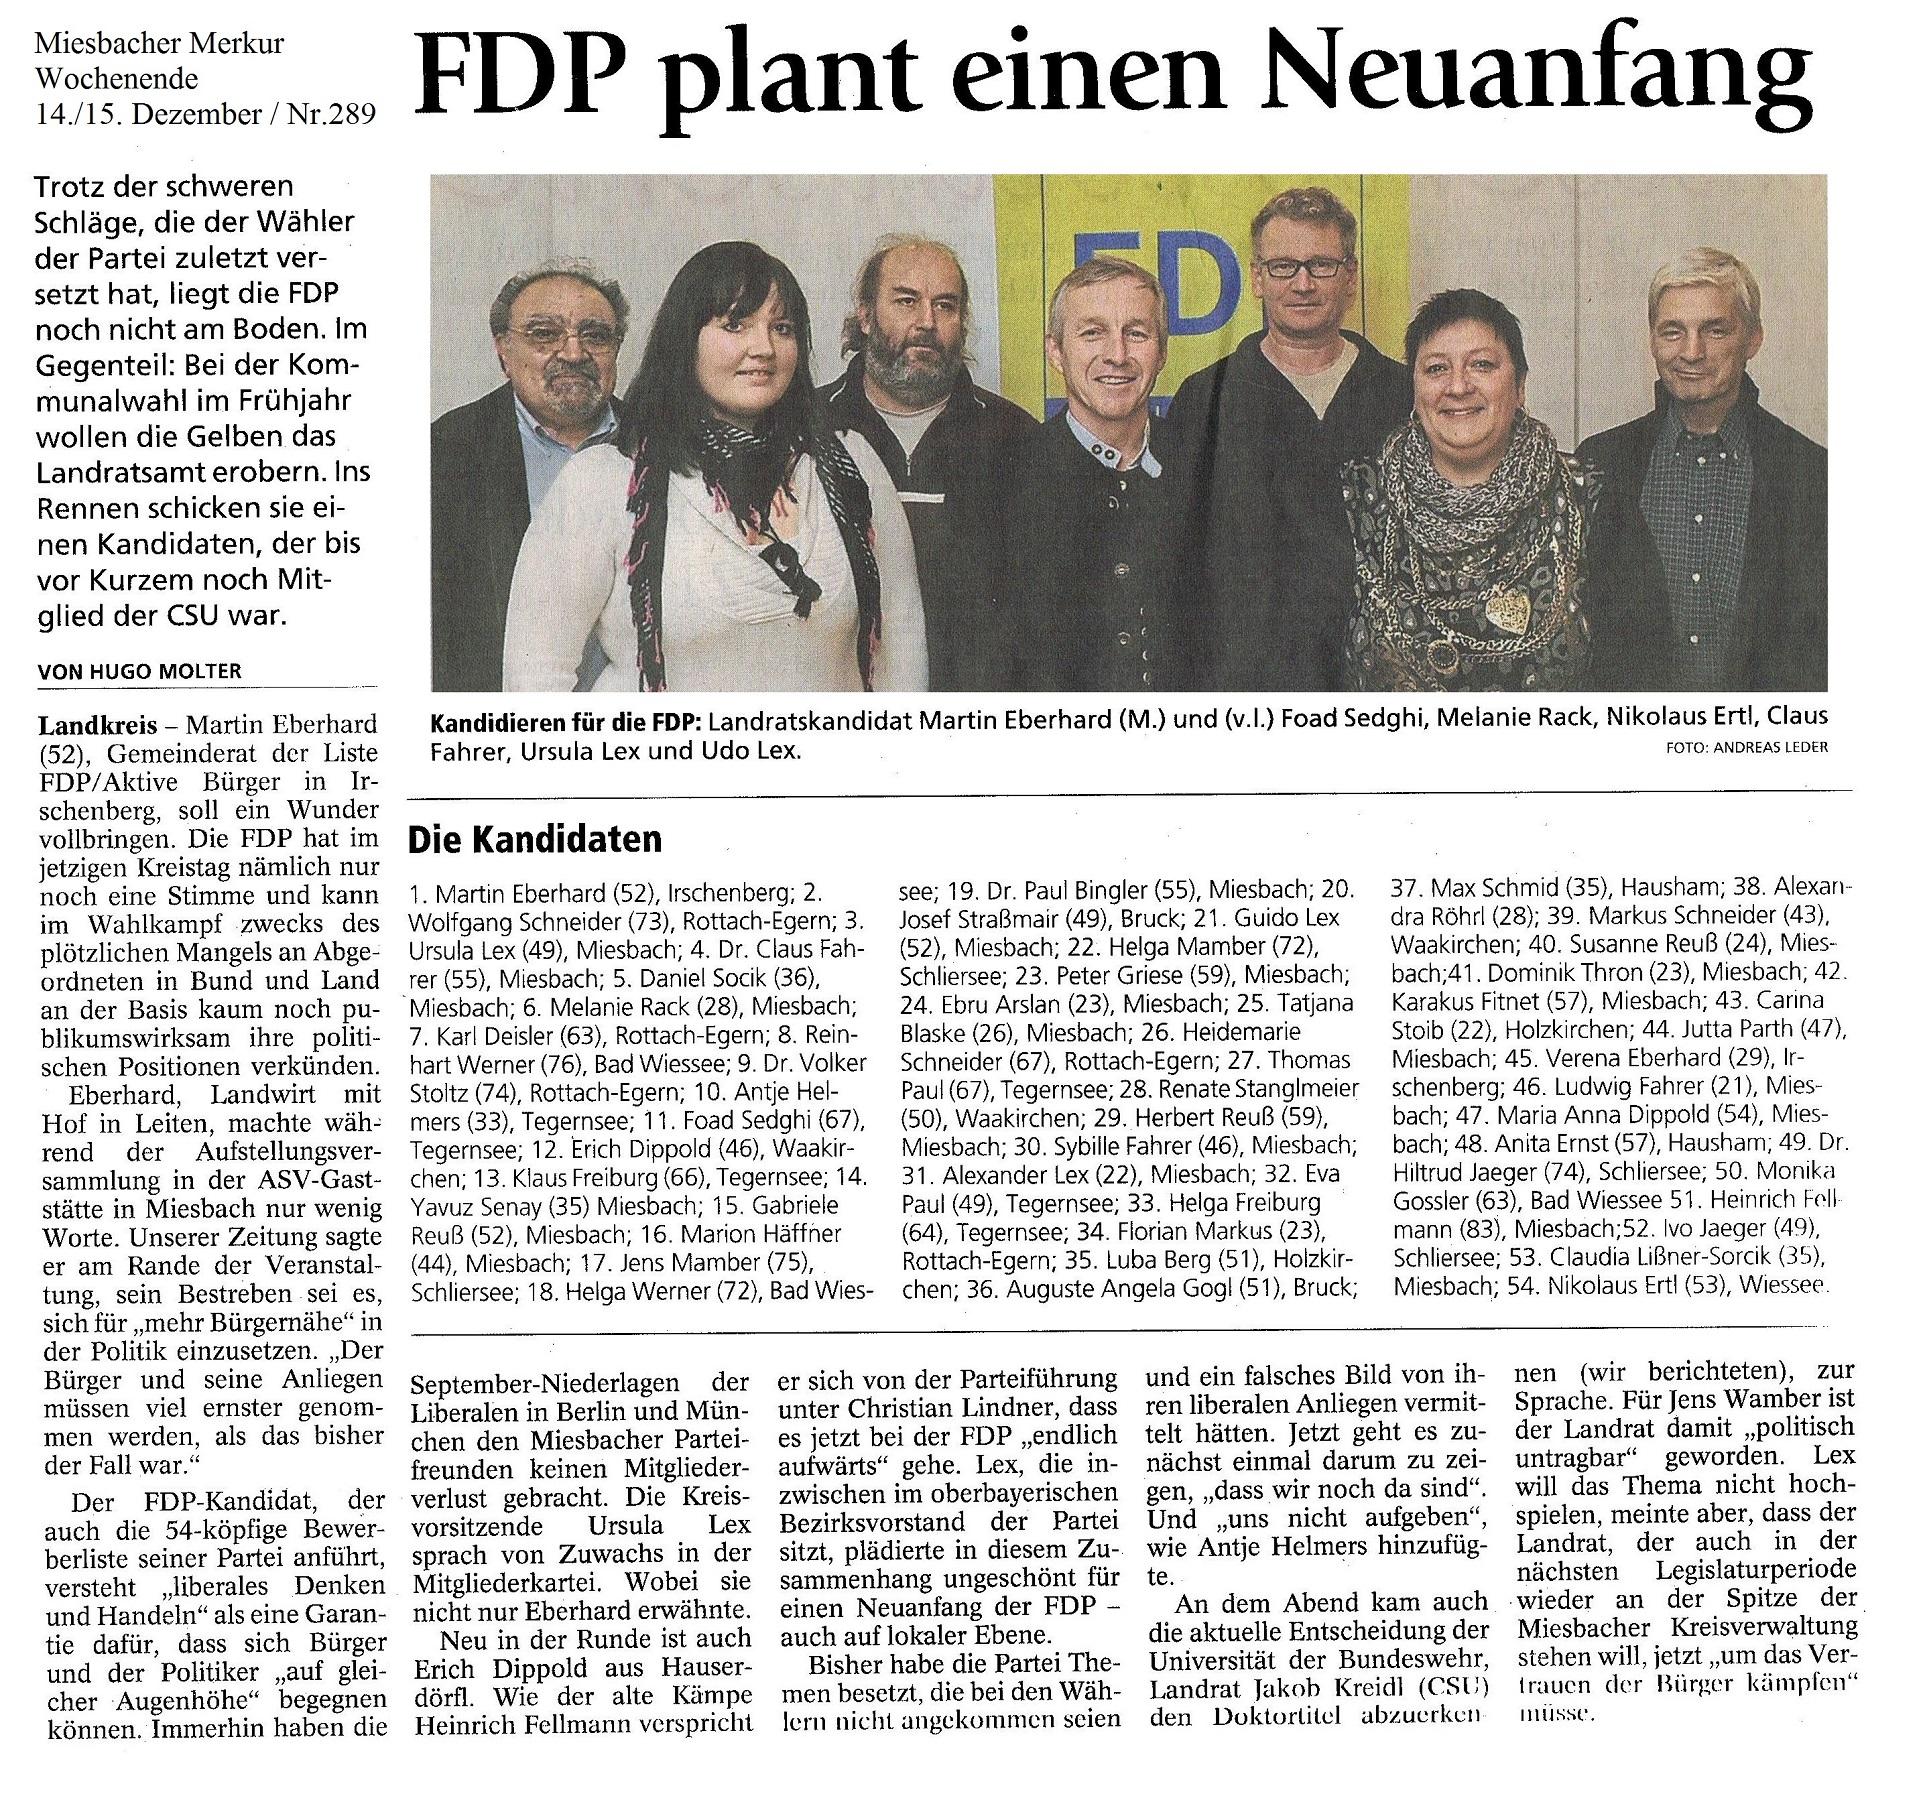 14. Dezember 2013: FDP plant einen Neuanfang (.jpg)